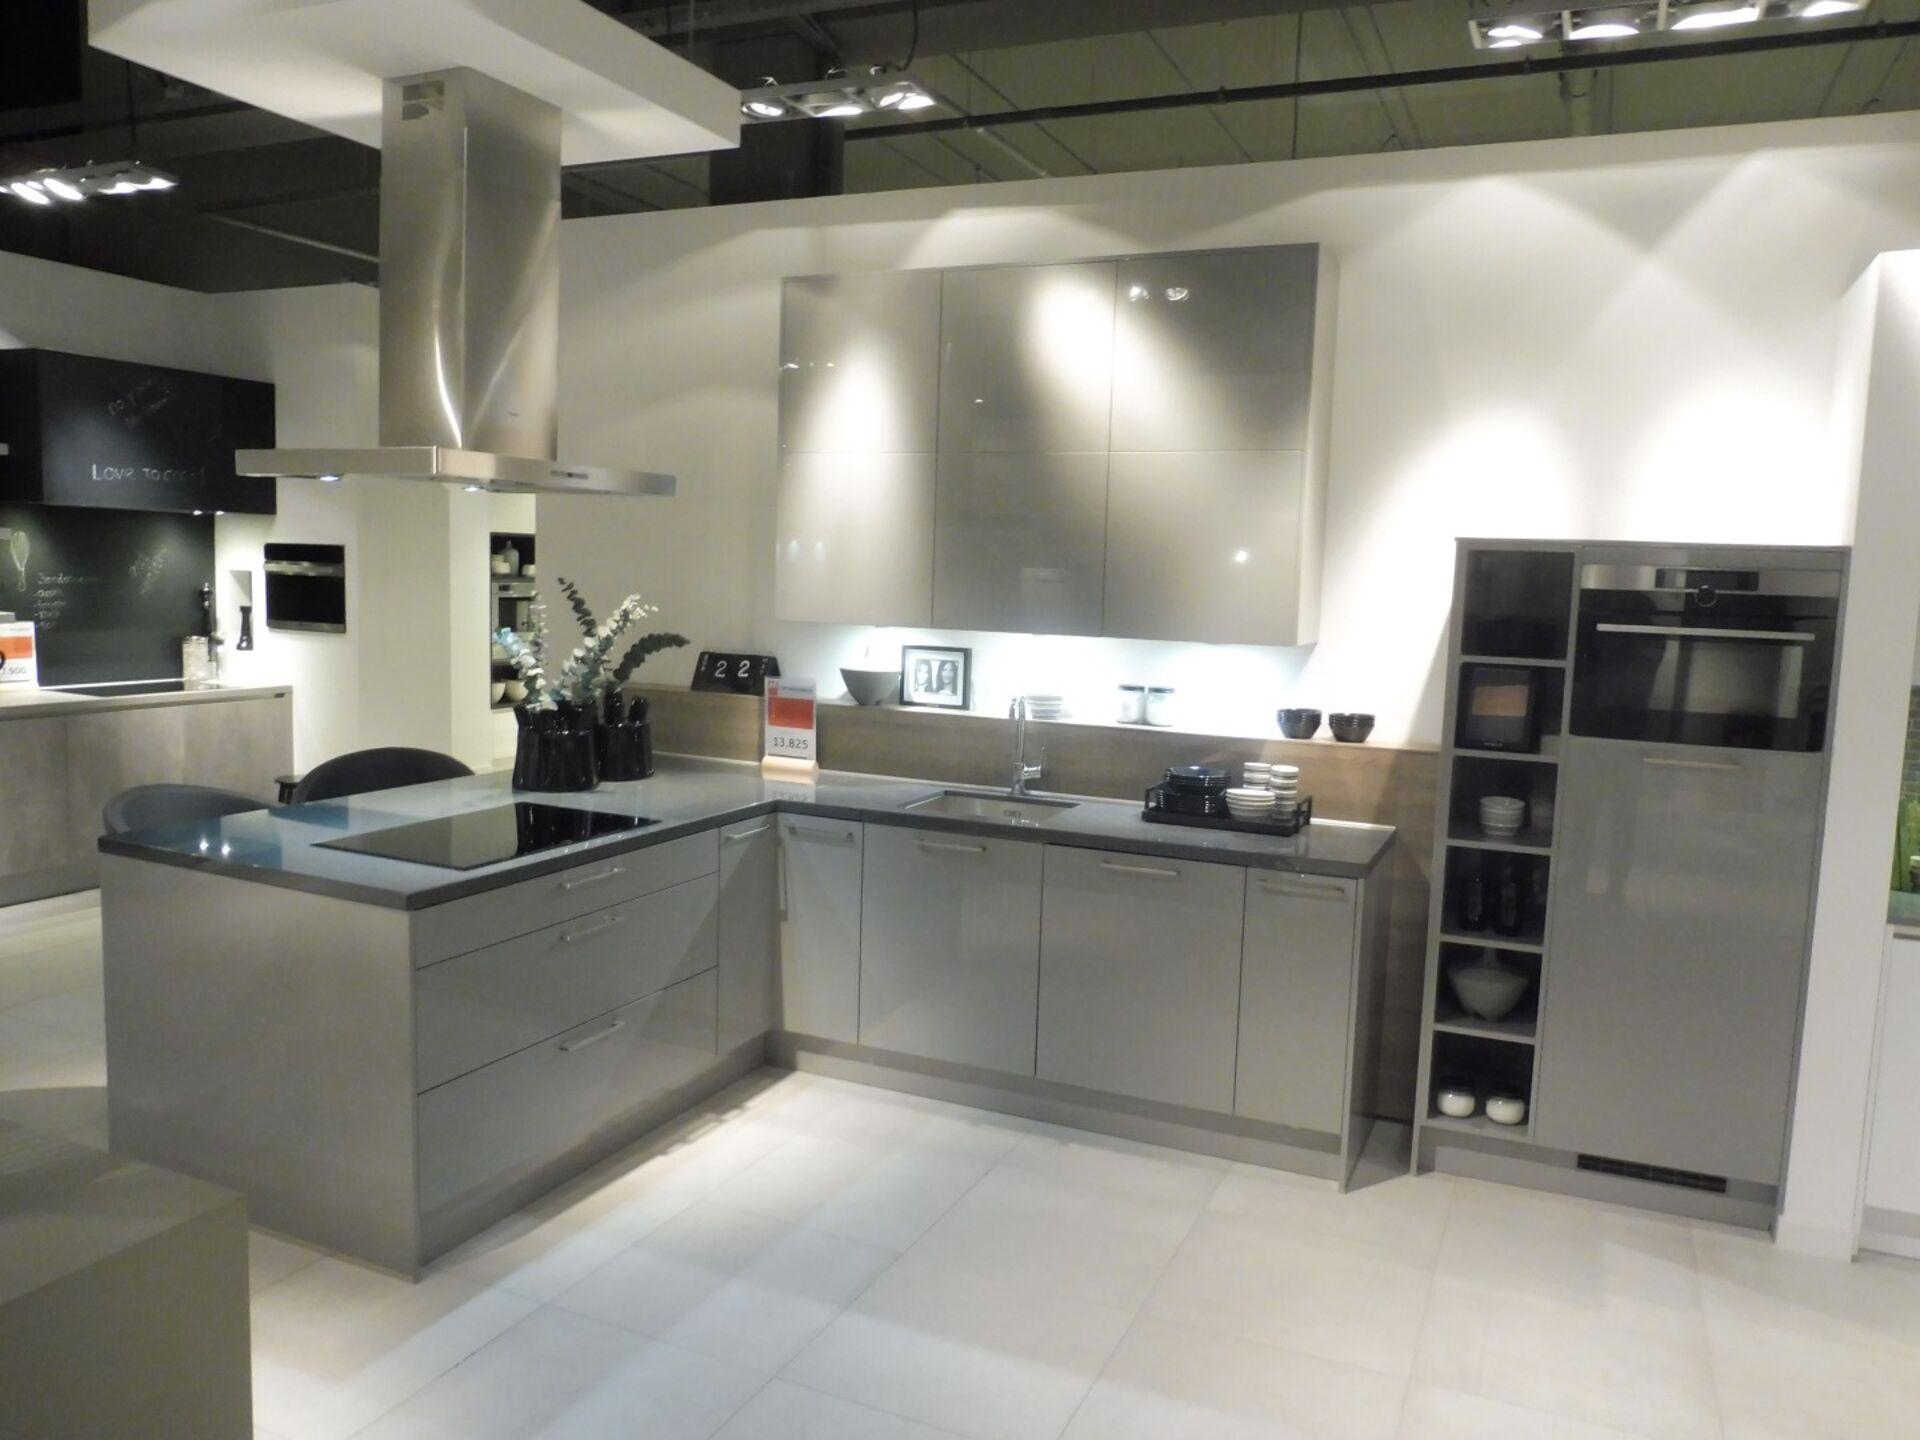 Showroomkeuken Parelgrijs hoogglans CVT keukens Breda